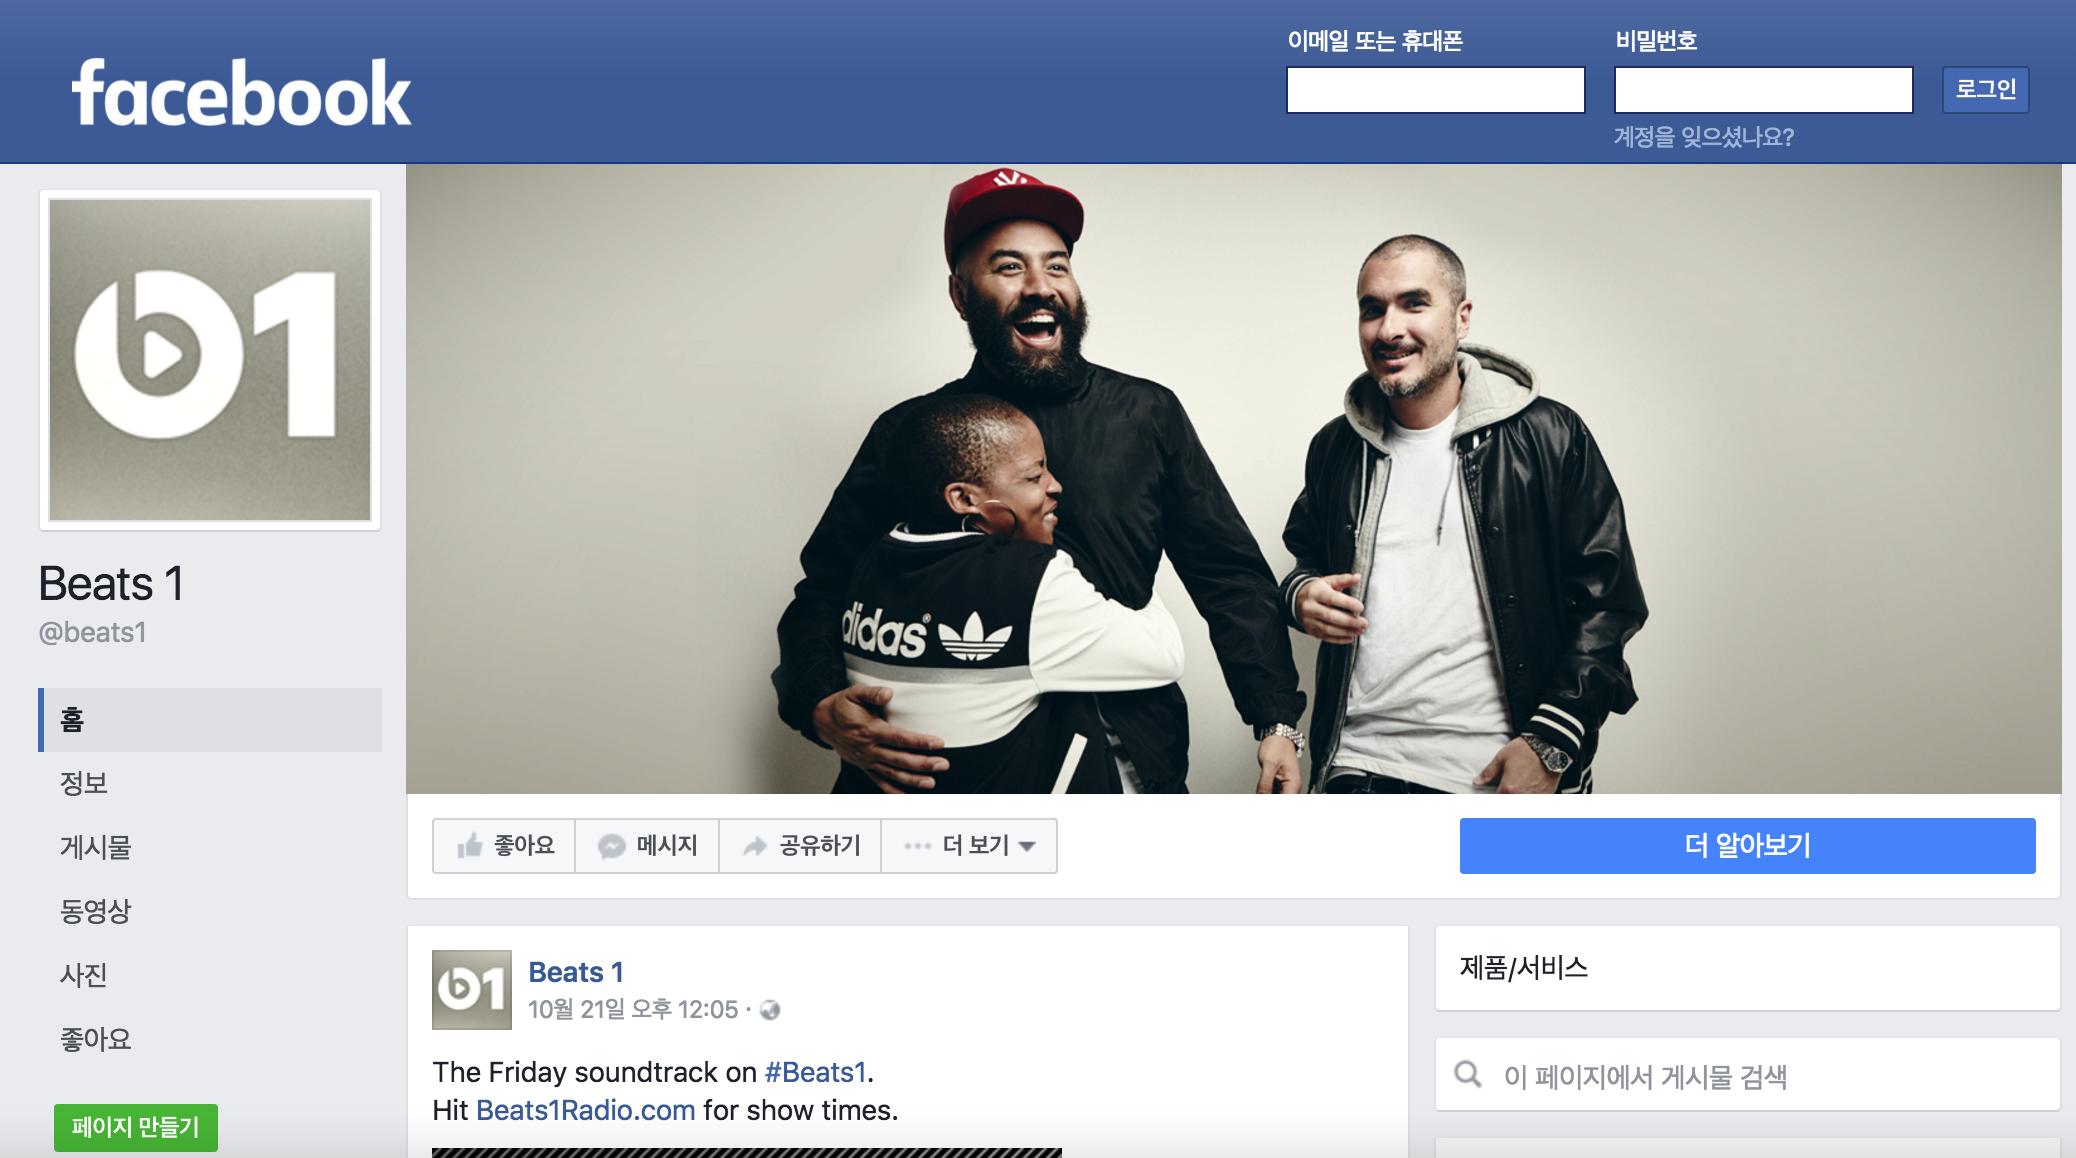 facebook_page_apple_beats1